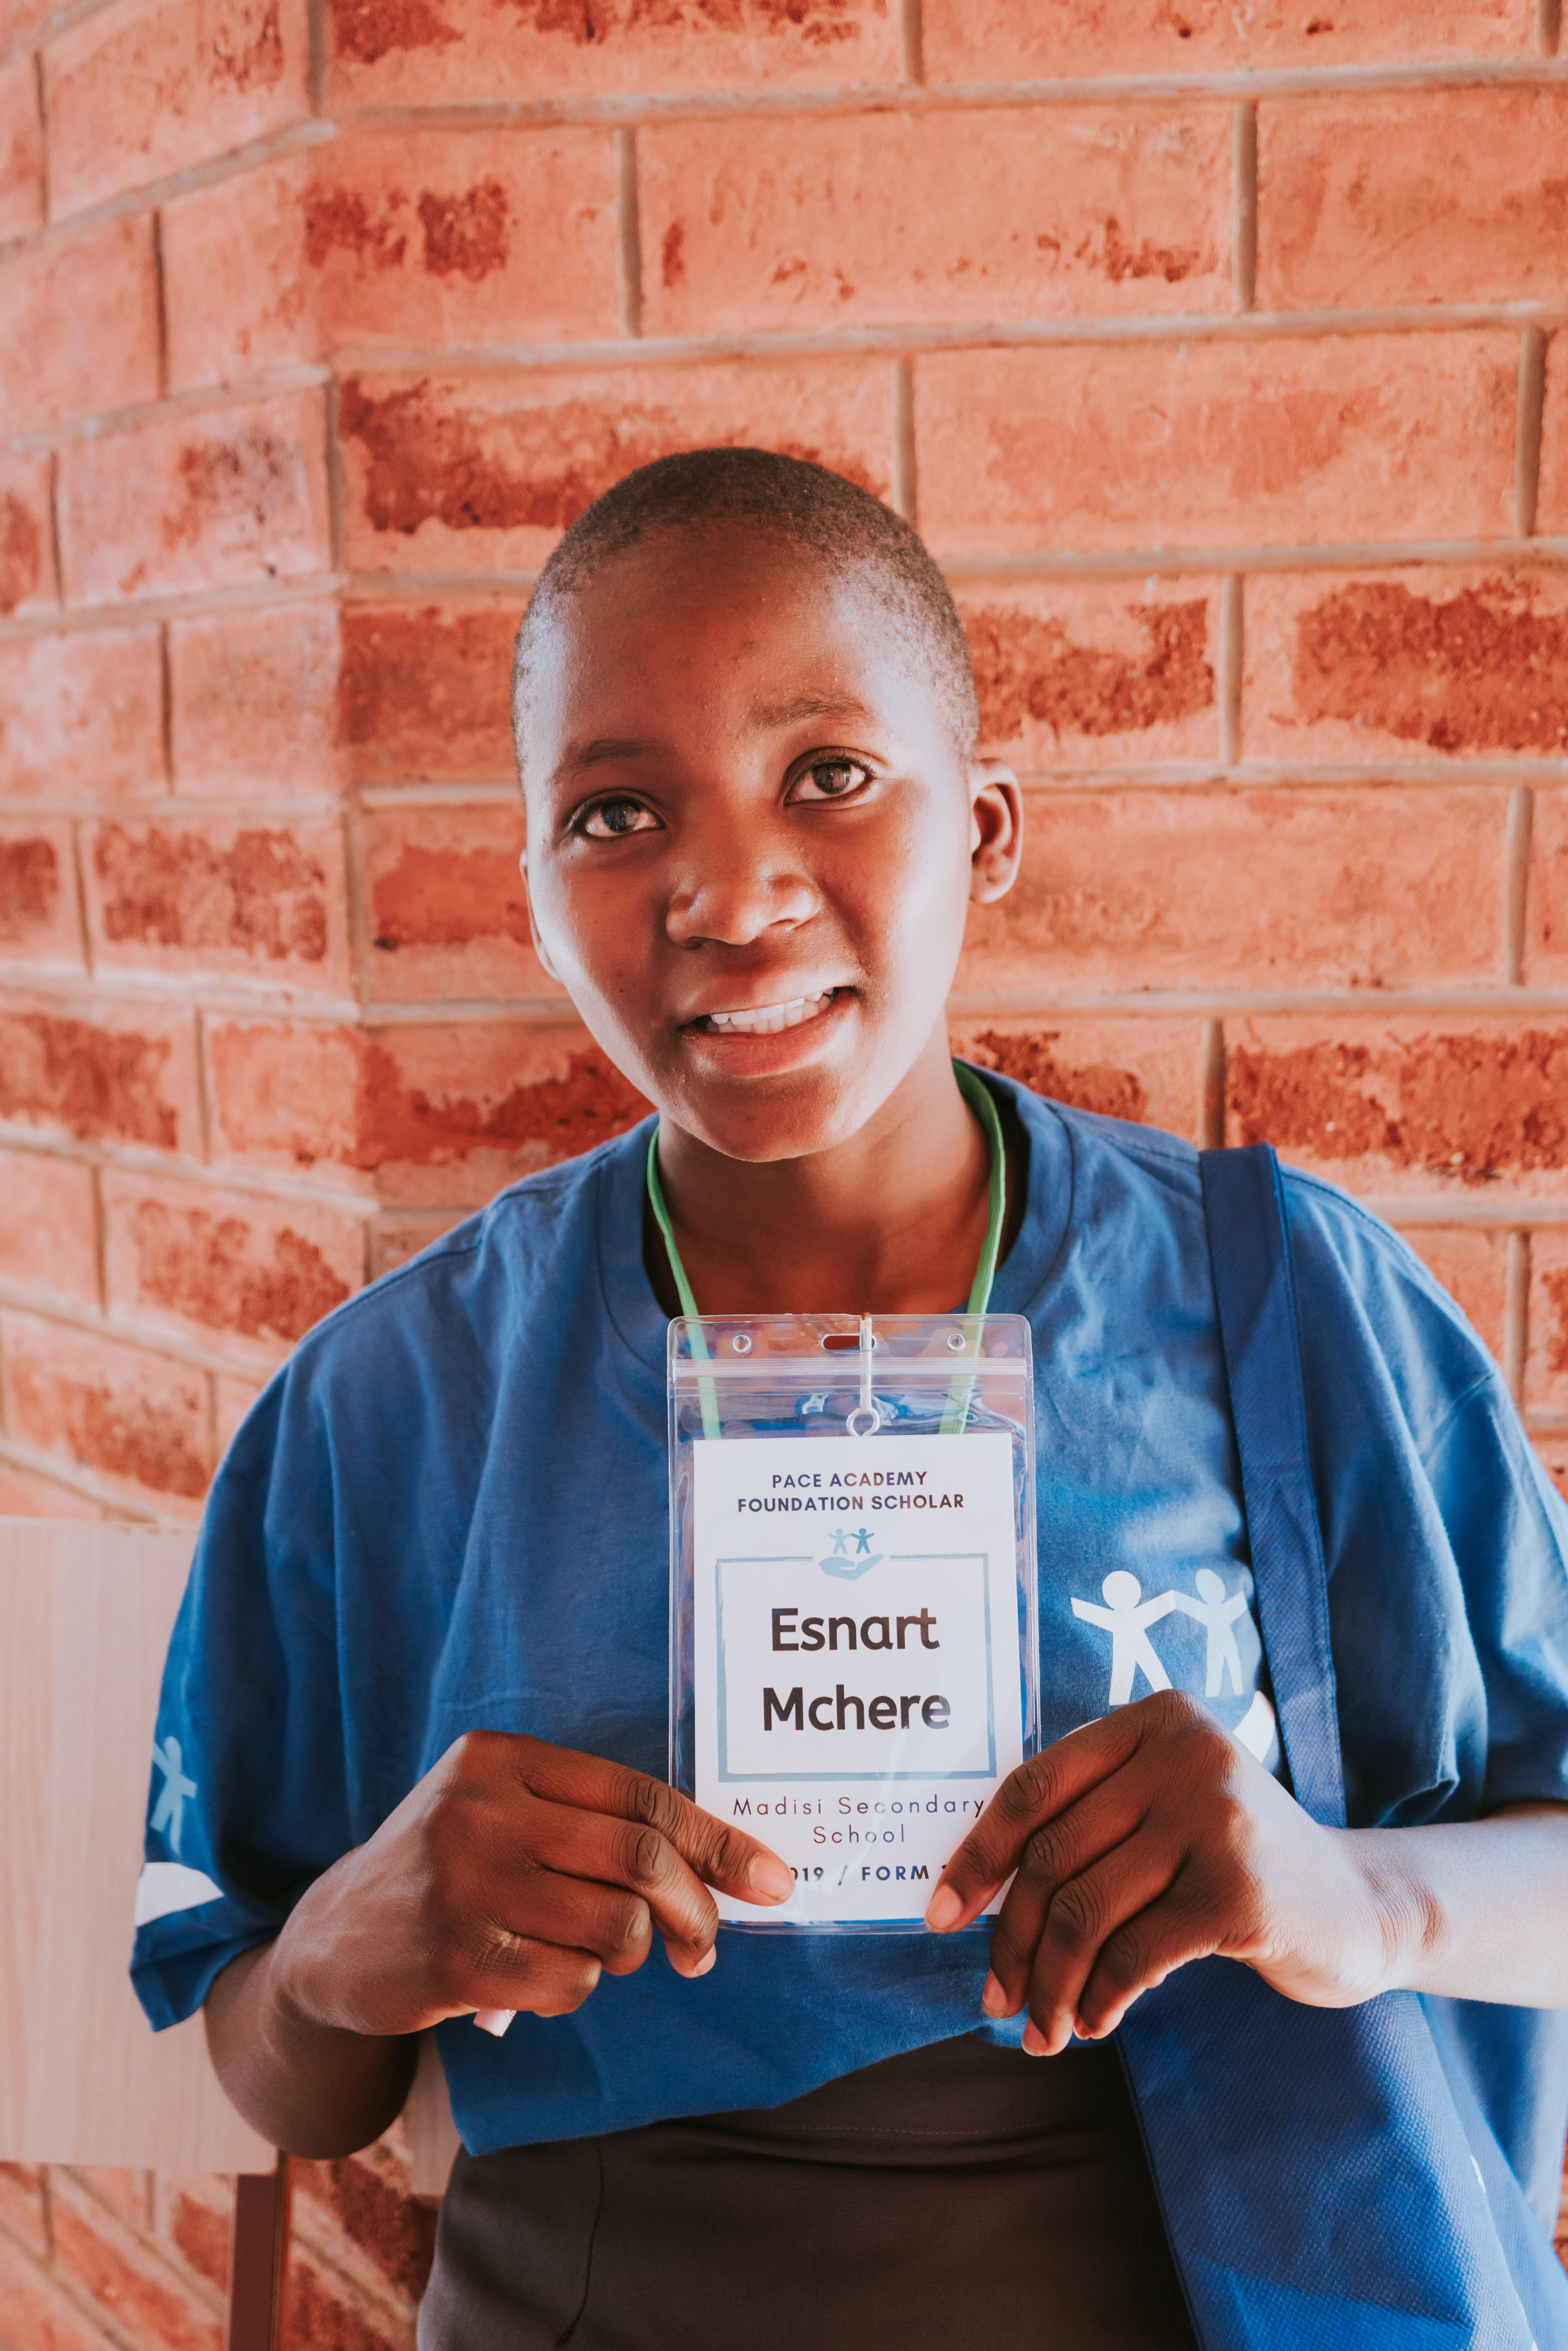 Esnart Mchere (Madisi Secondary School)